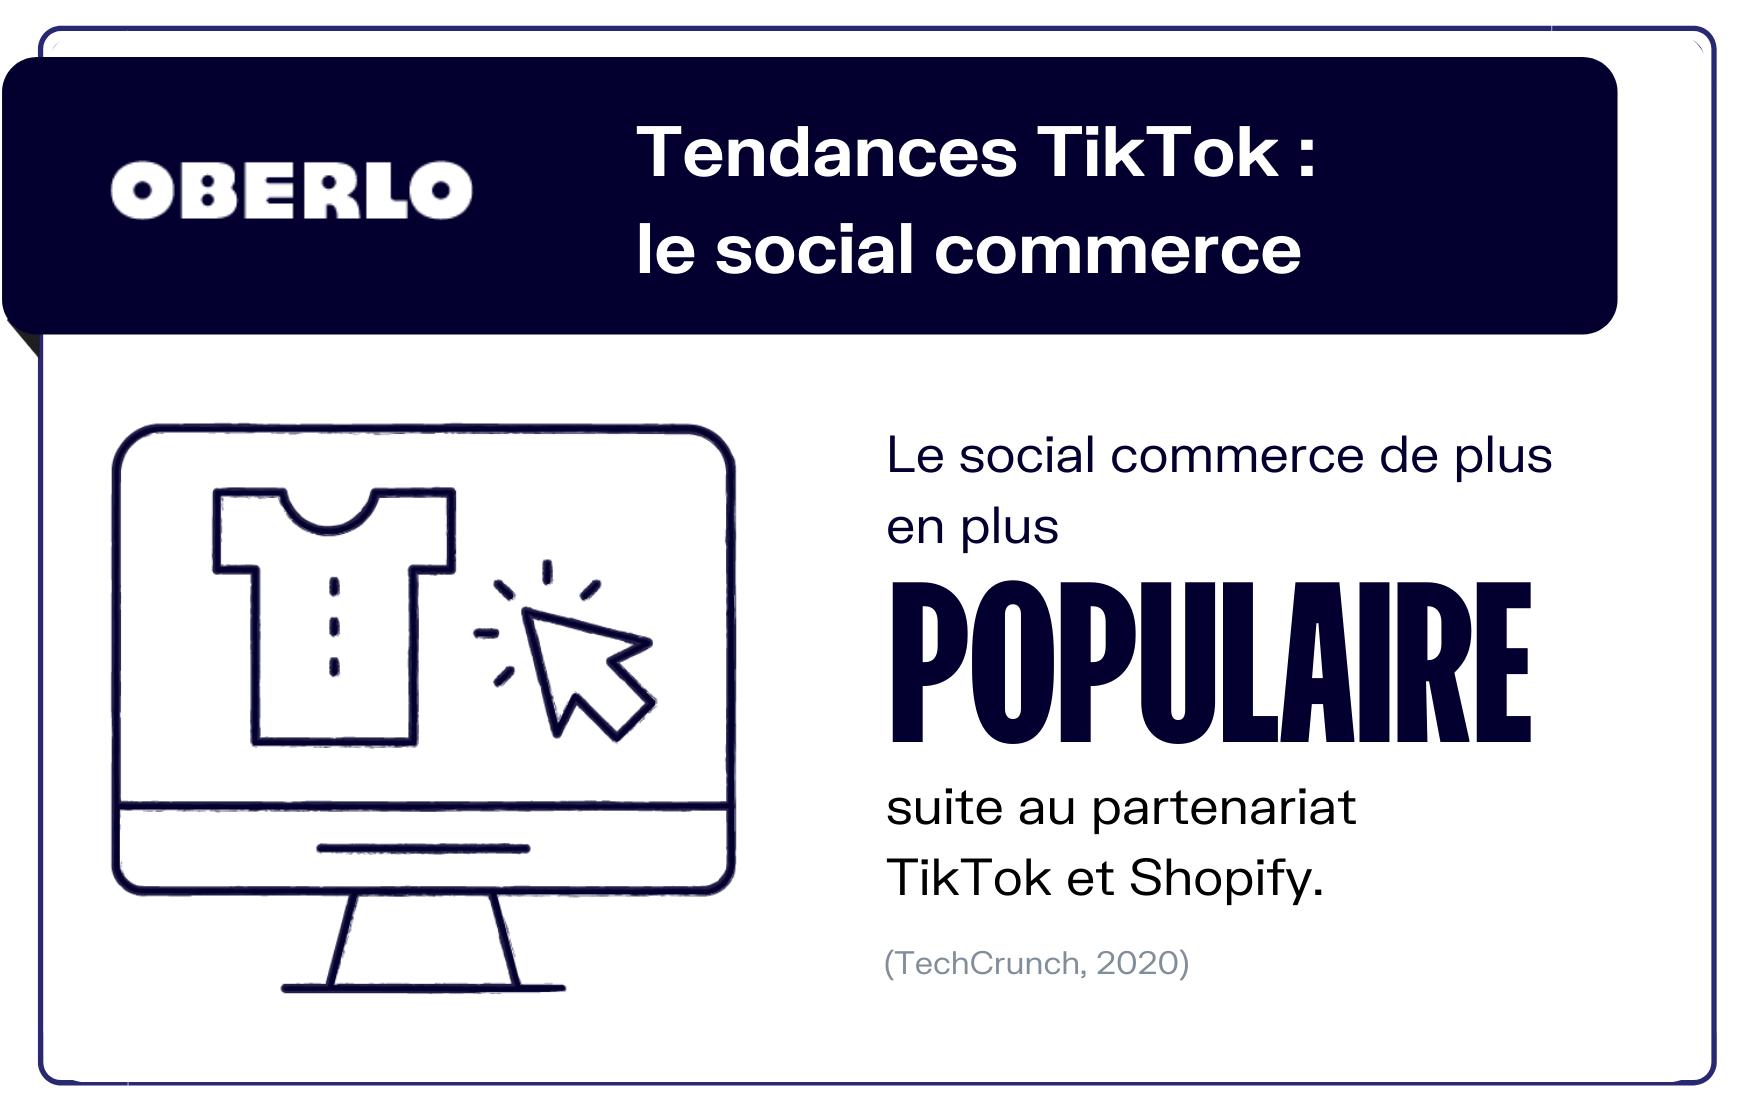 Tendance Tik Tok social commerce